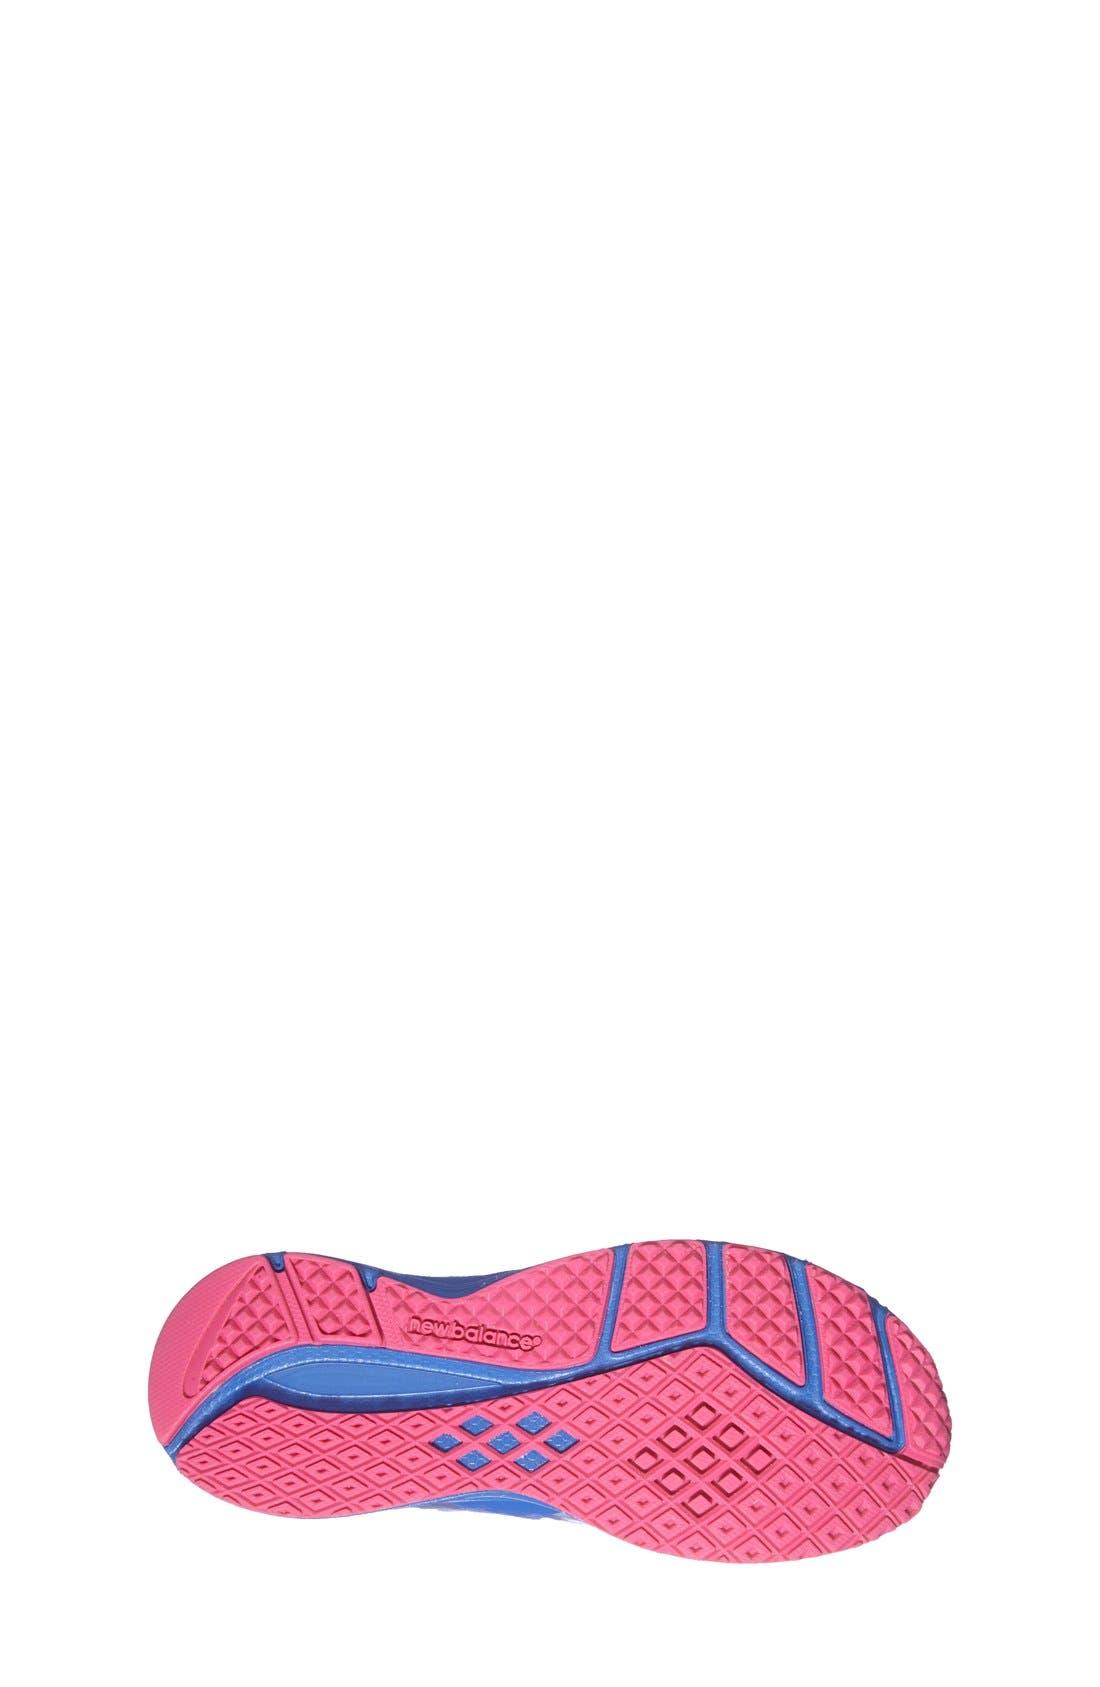 Alternate Image 4  - New Balance 'Update 890 Beetles & Butterfly' Athletic Shoe (Toddler, Little Kid & Big Kid)